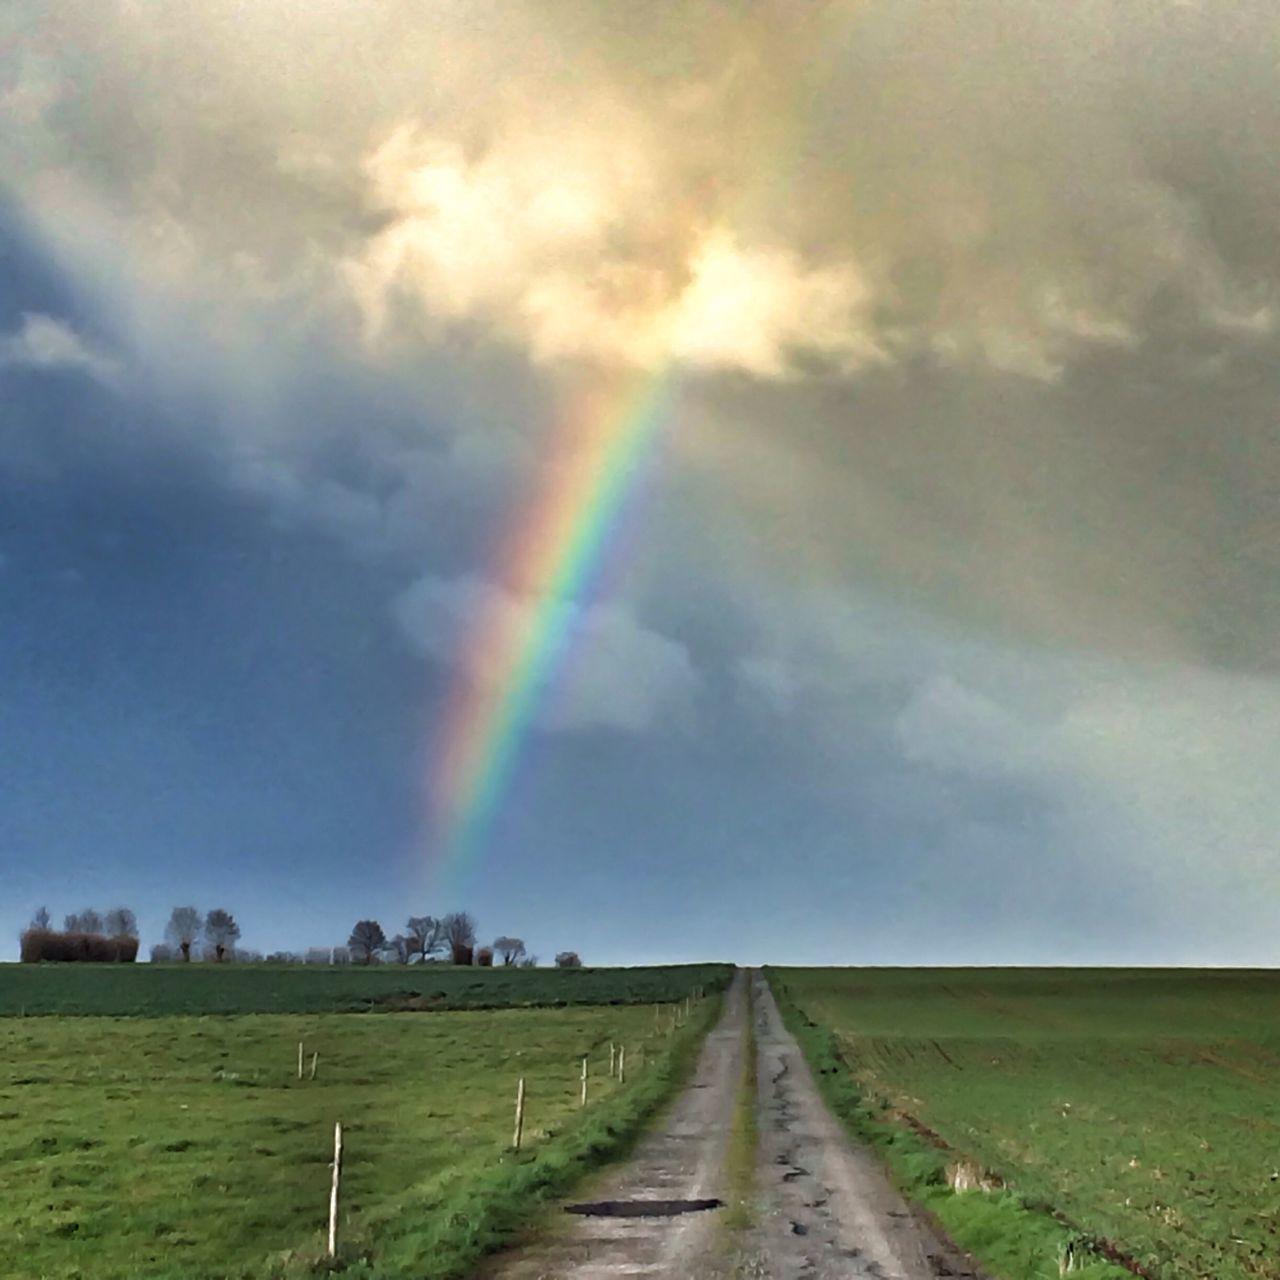 Dirt road and beautiful rainbow